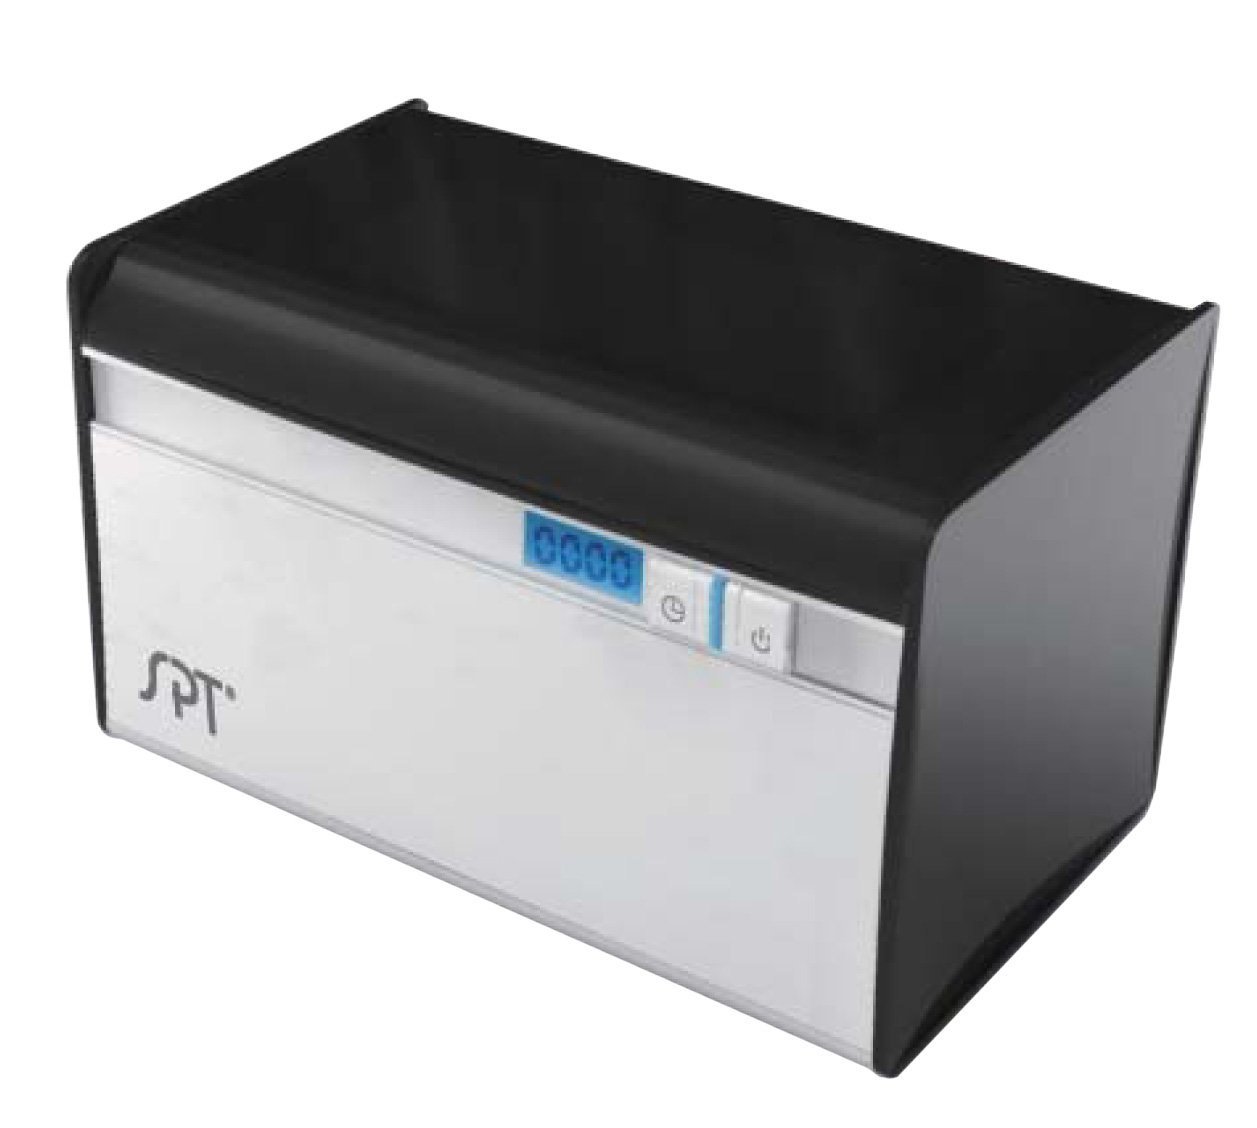 SPT LCD Display Ultrasonic Cleaner, Multi